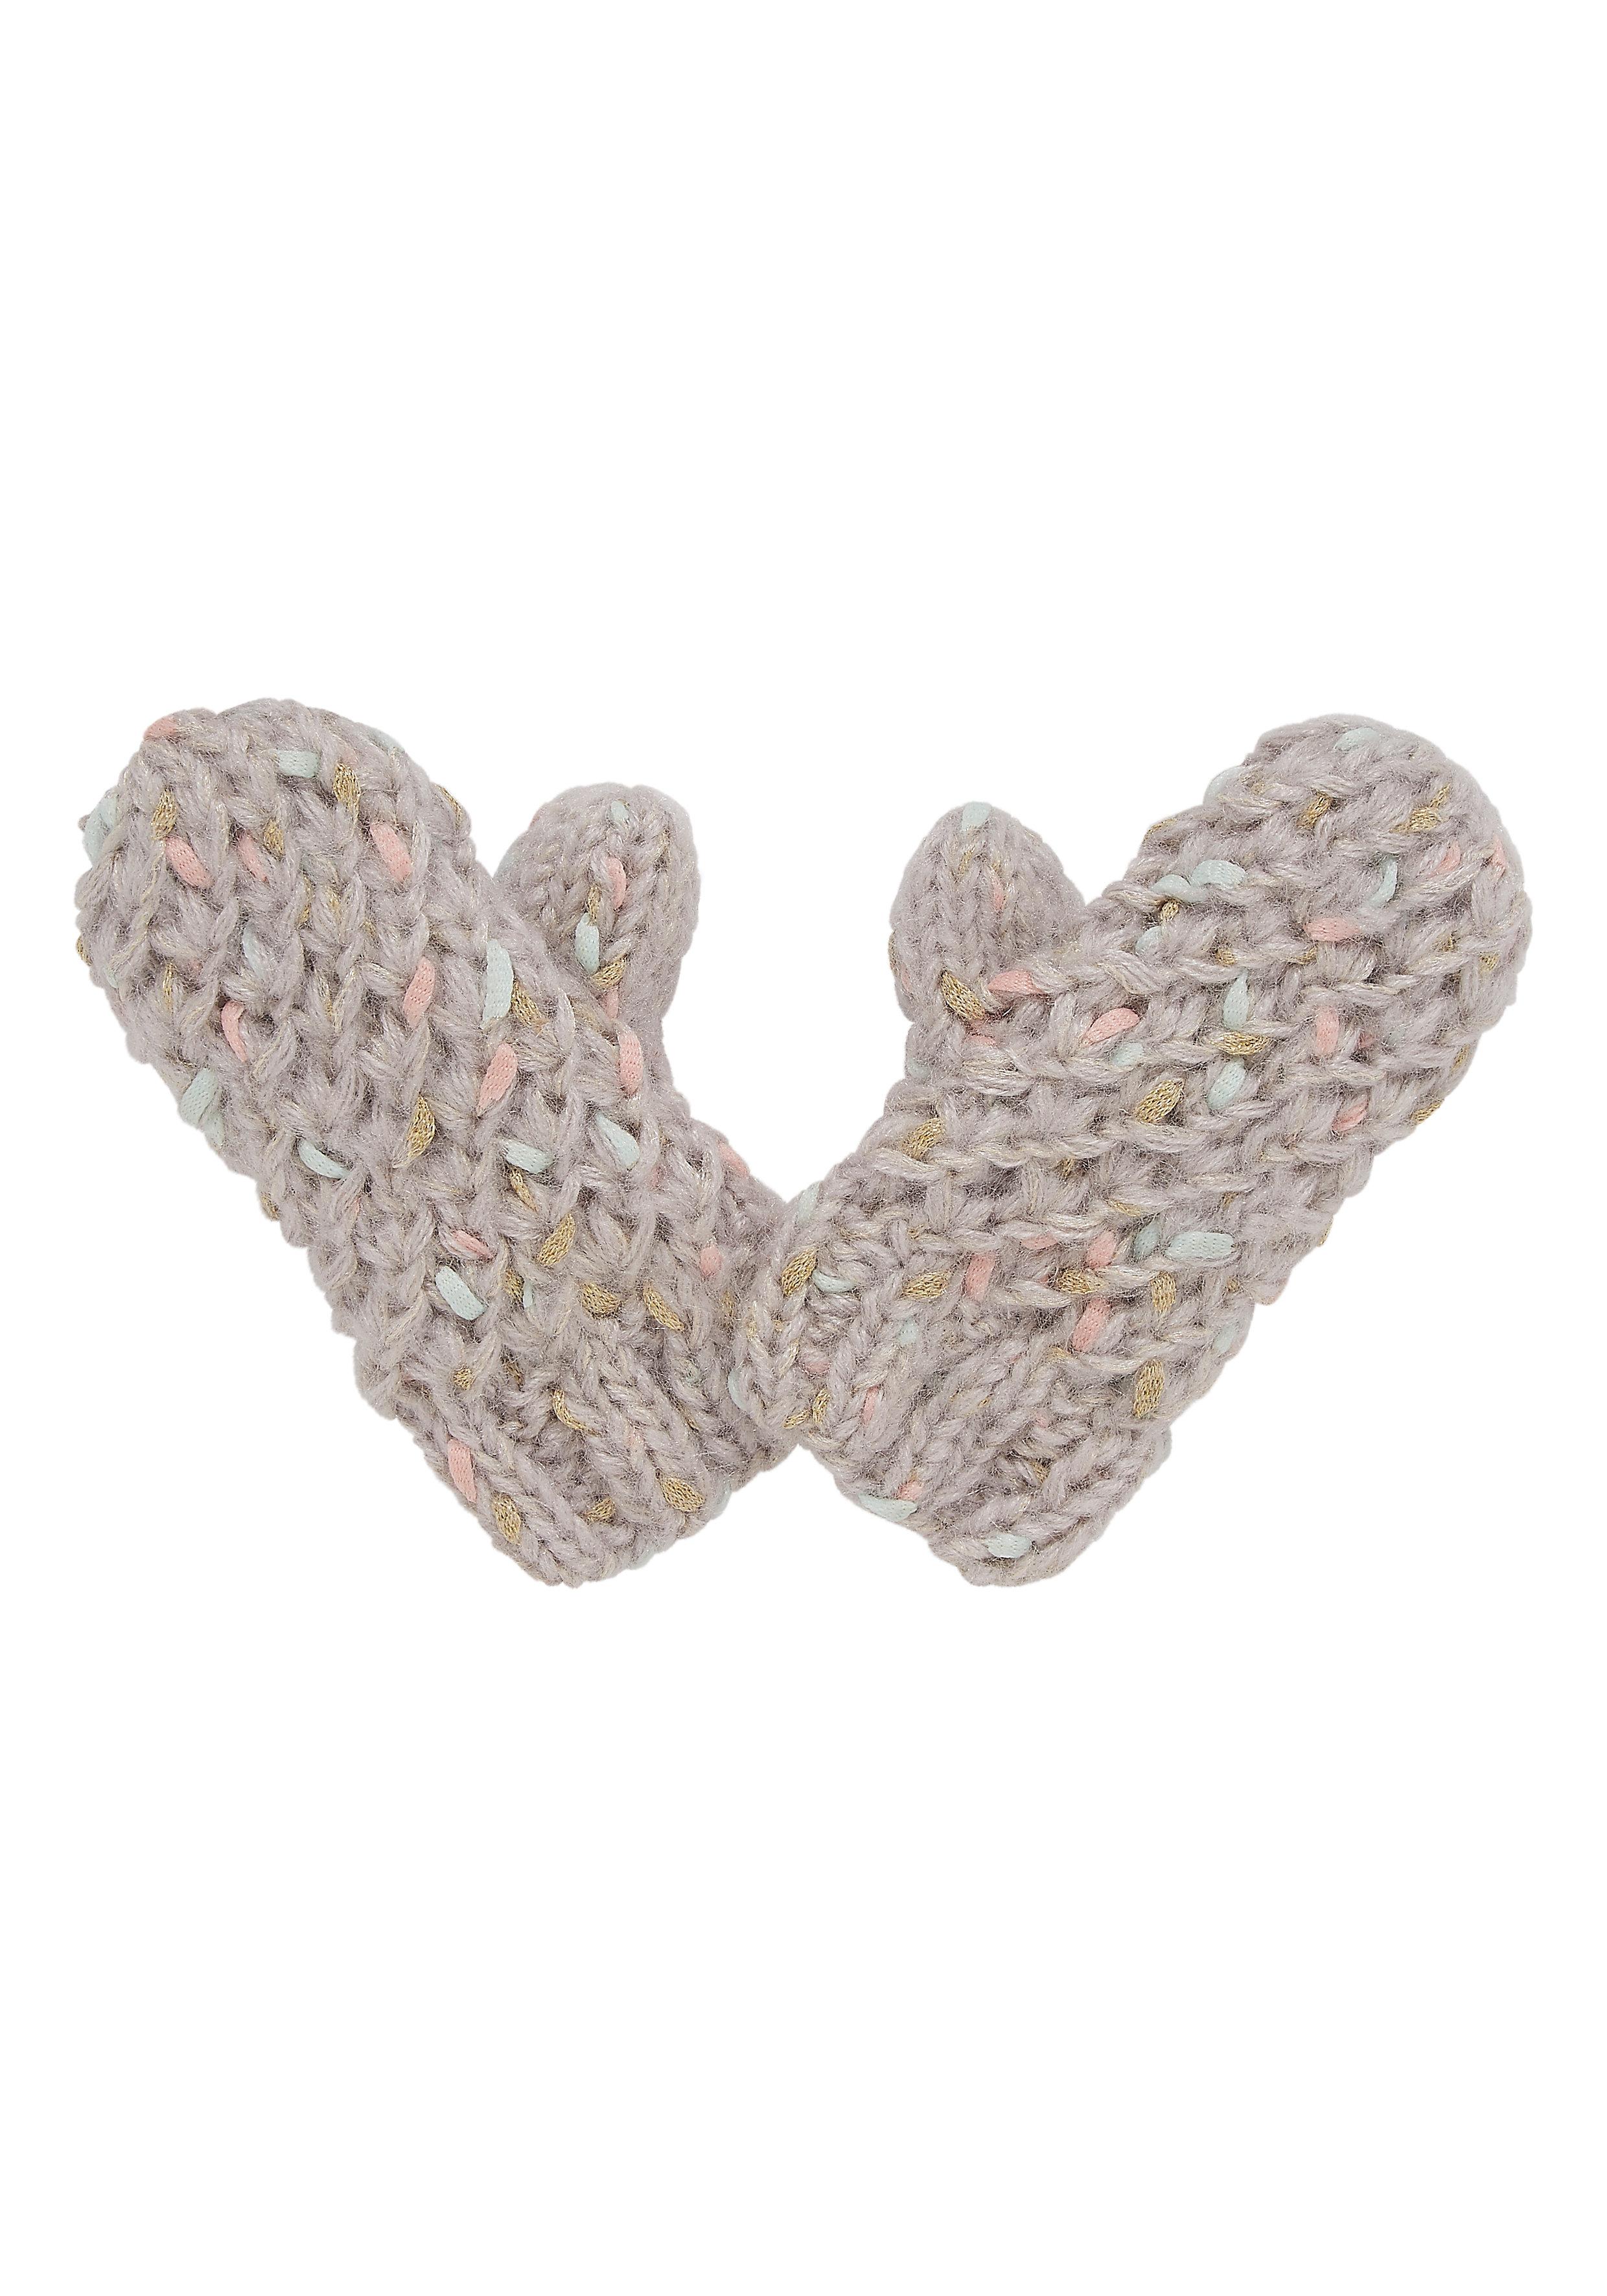 Mothercare | Girls Gloves - Beige